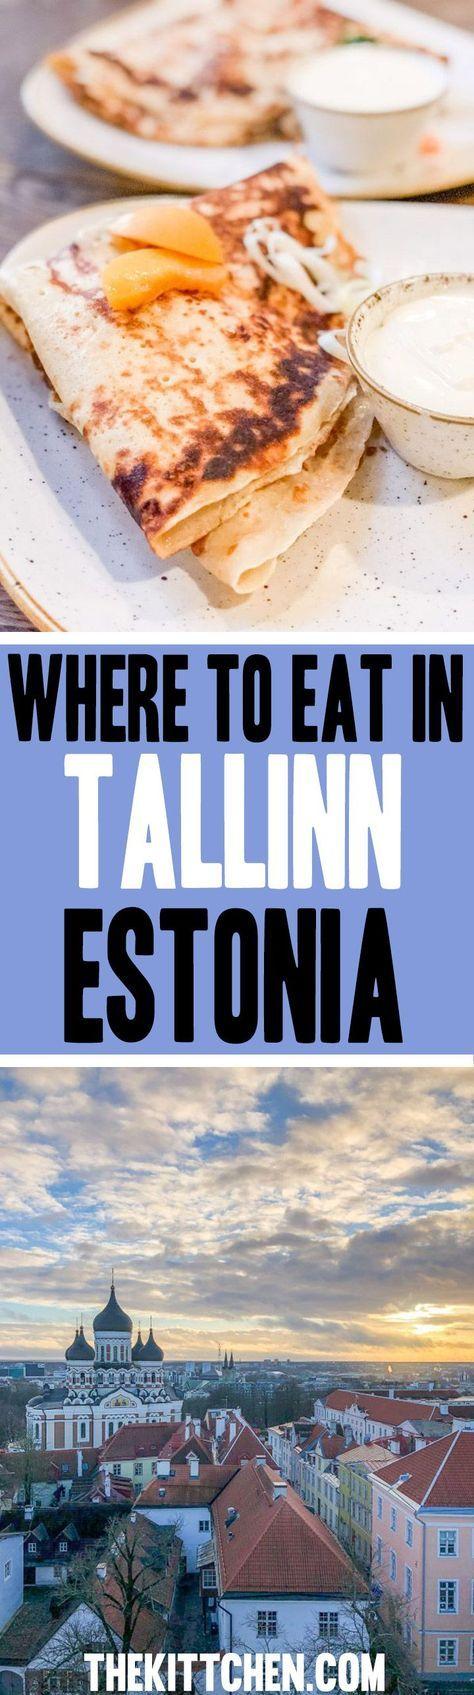 Estonia s capital city is filled diverse